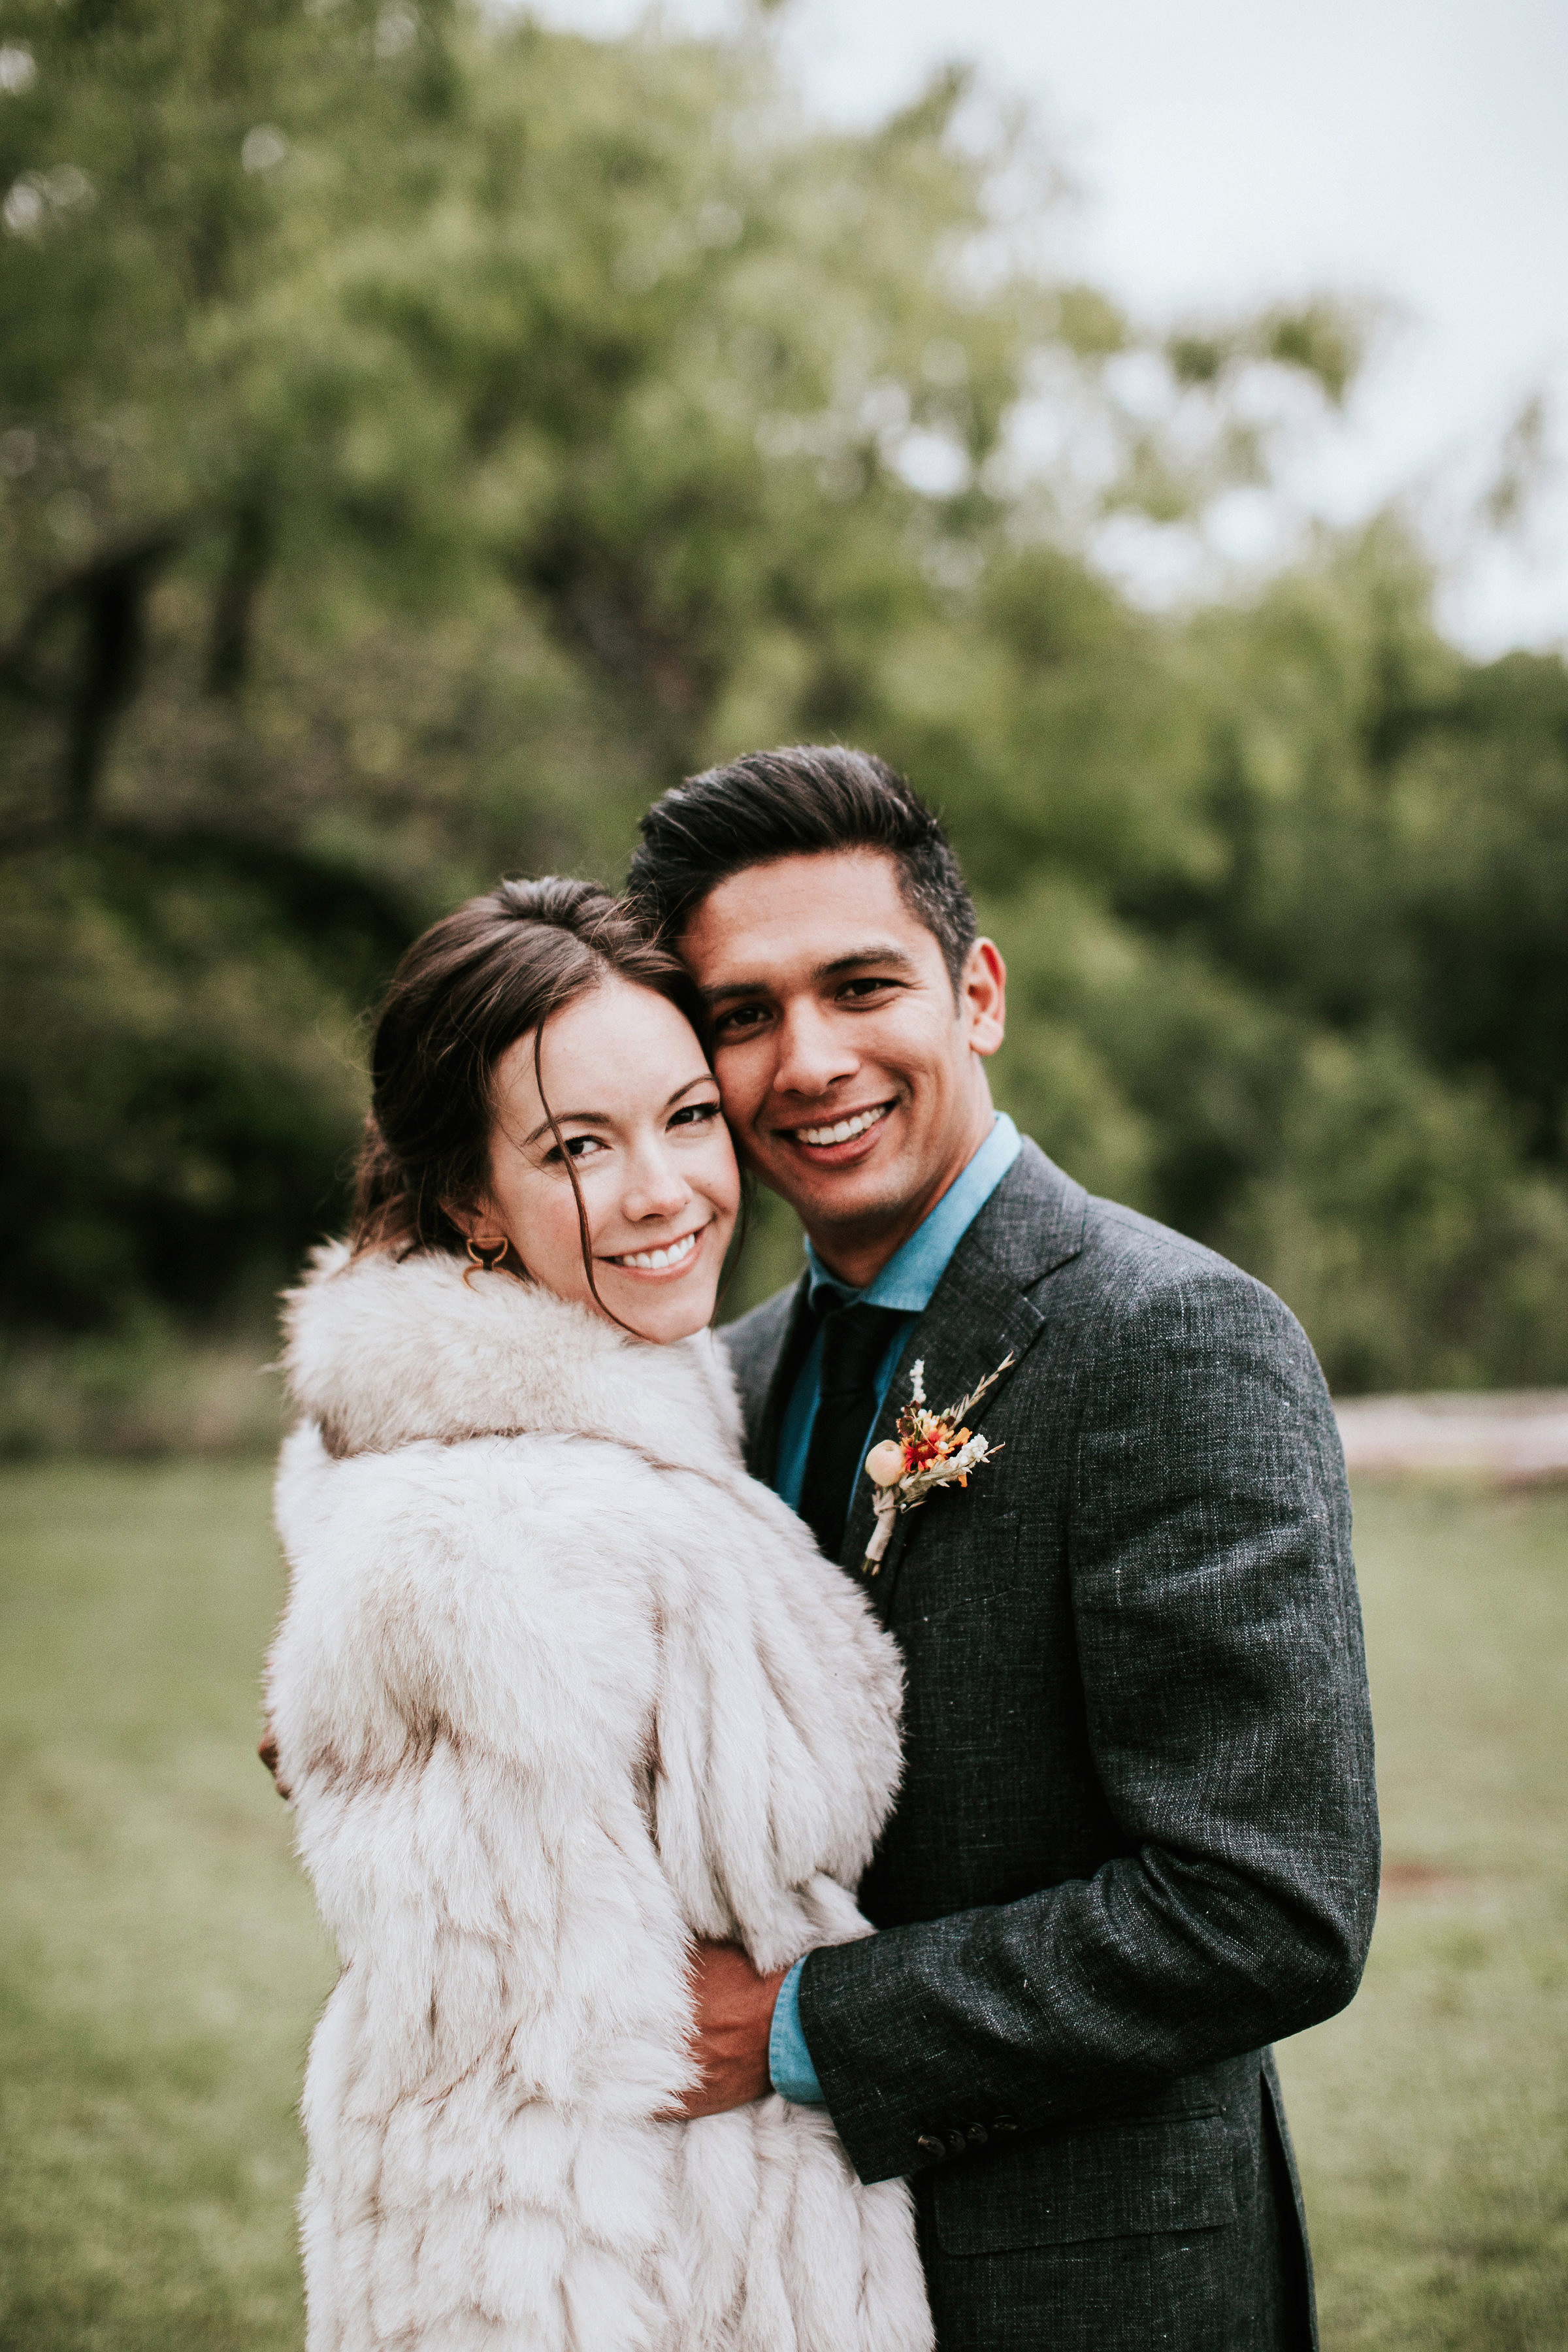 shannon jason wedding bride groom couple